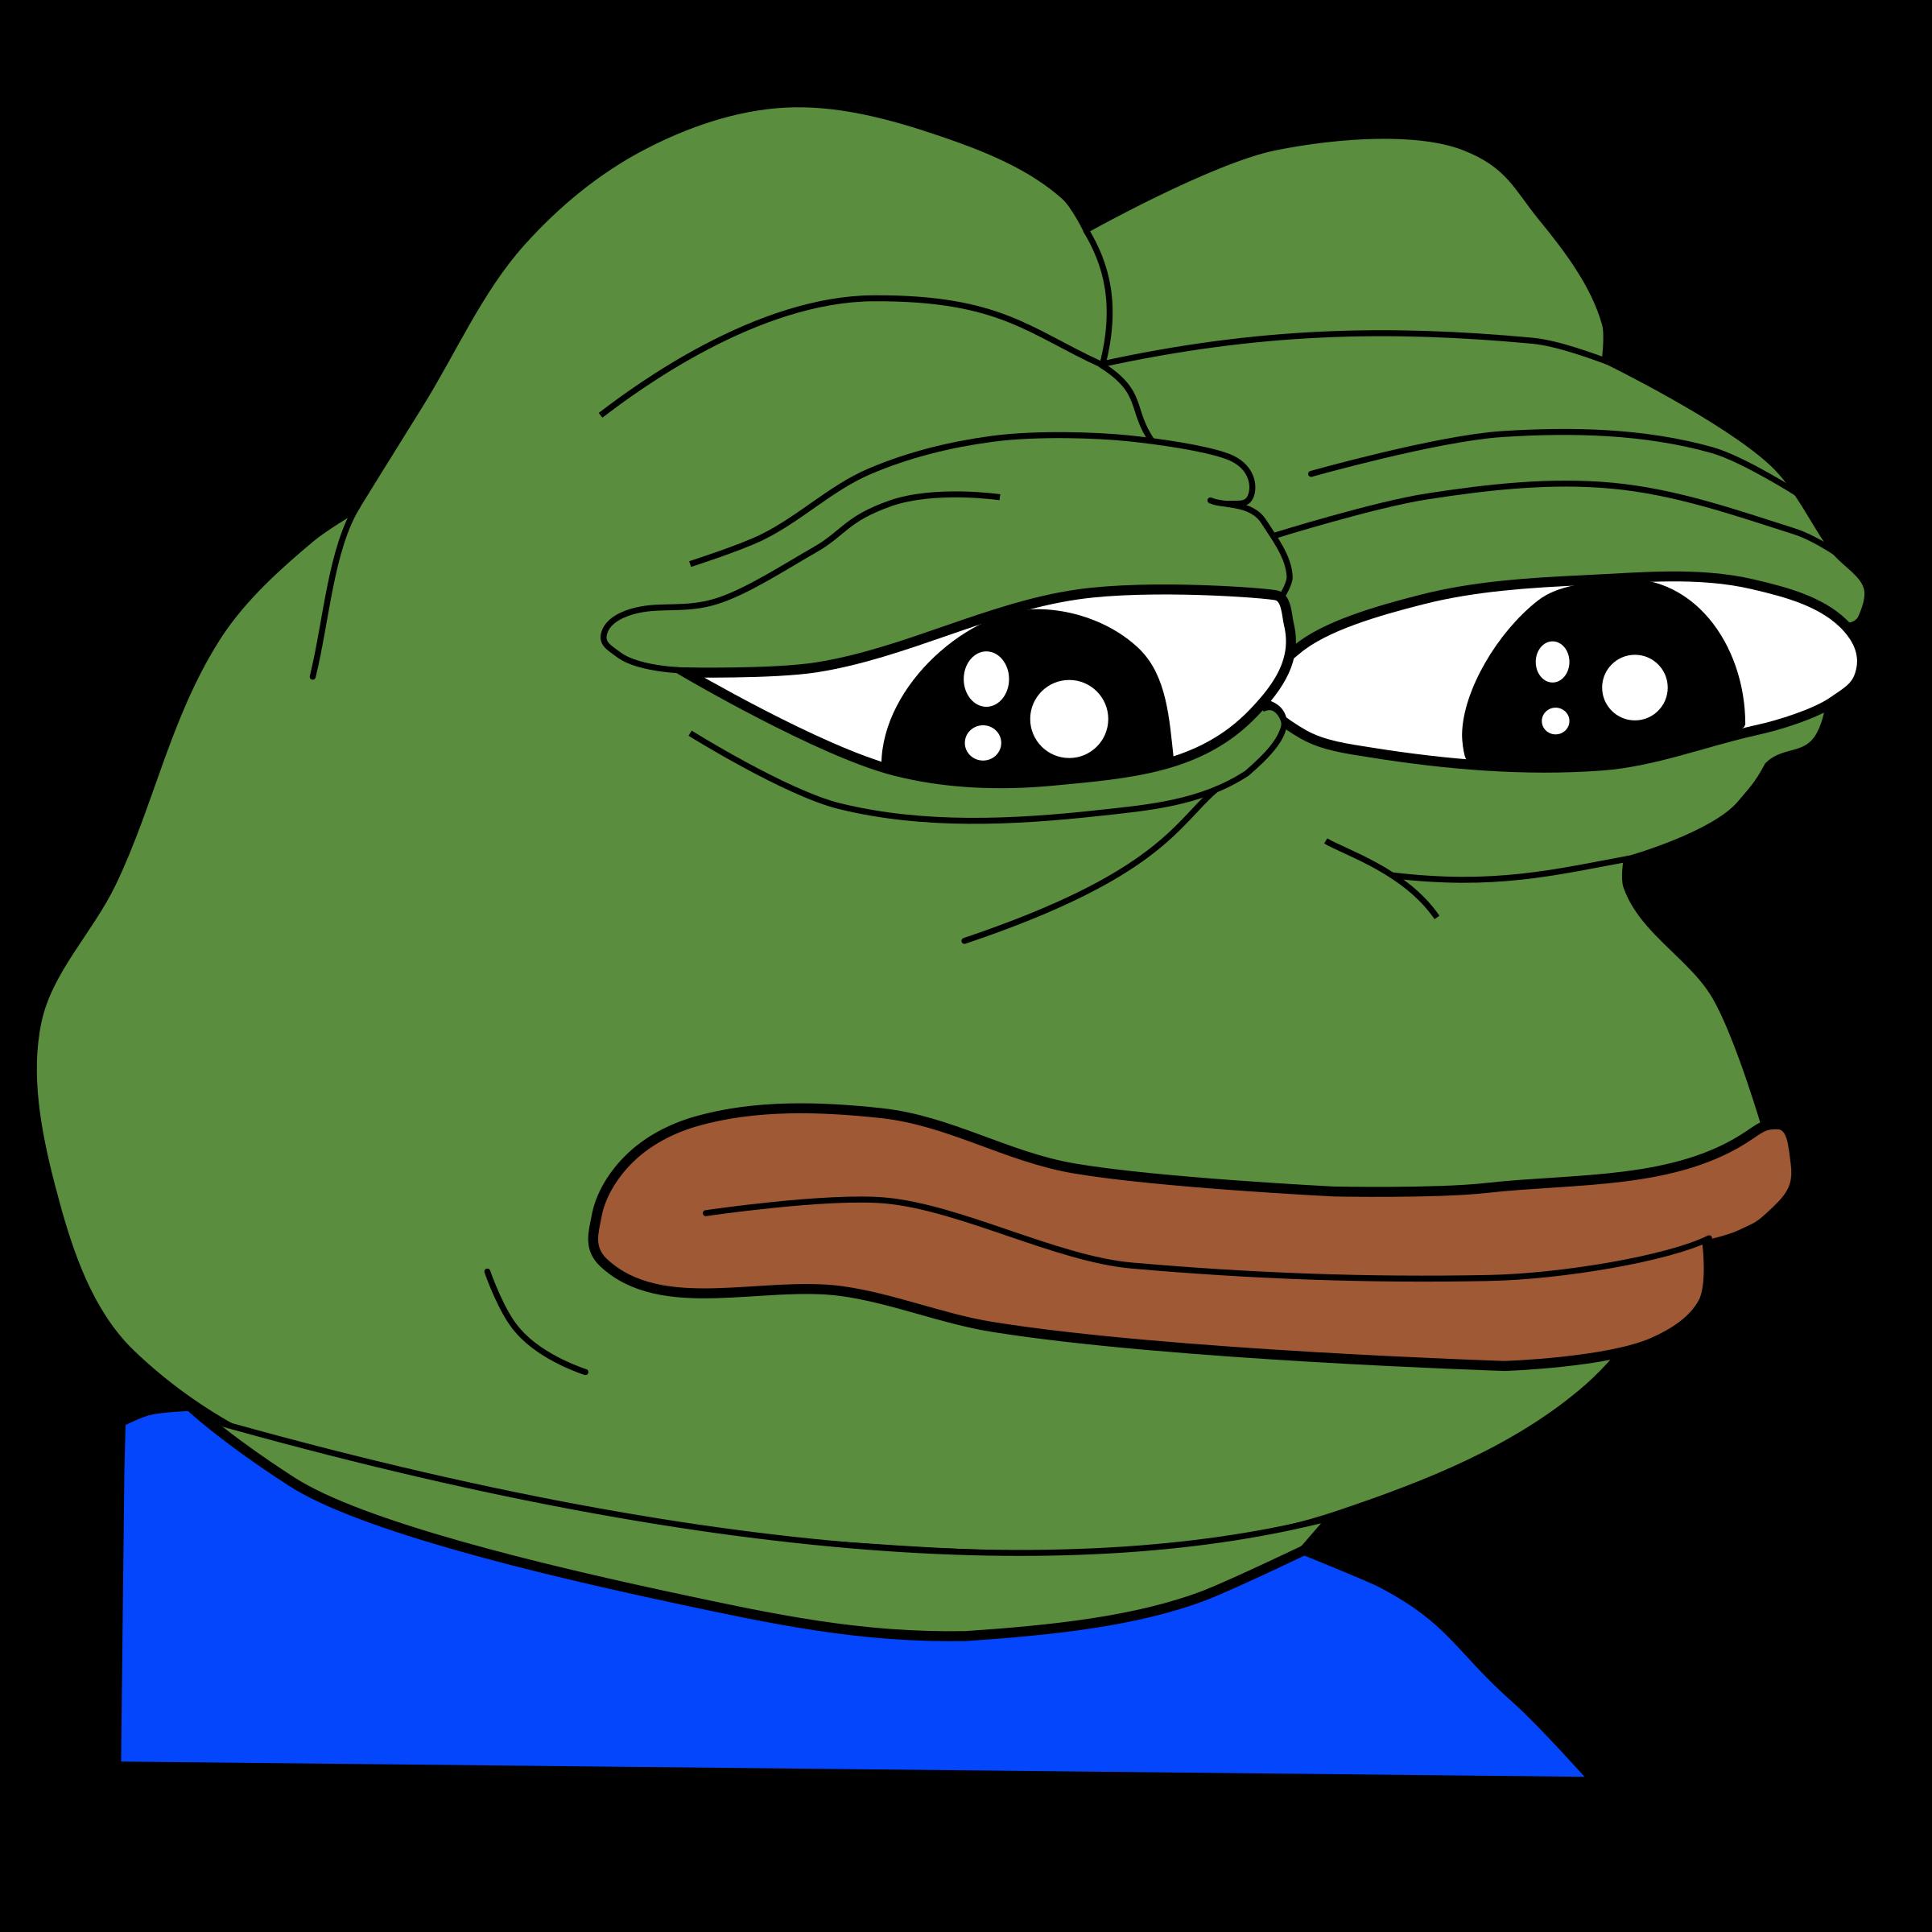 Depression clipart melancholy. Sad frog feels bad